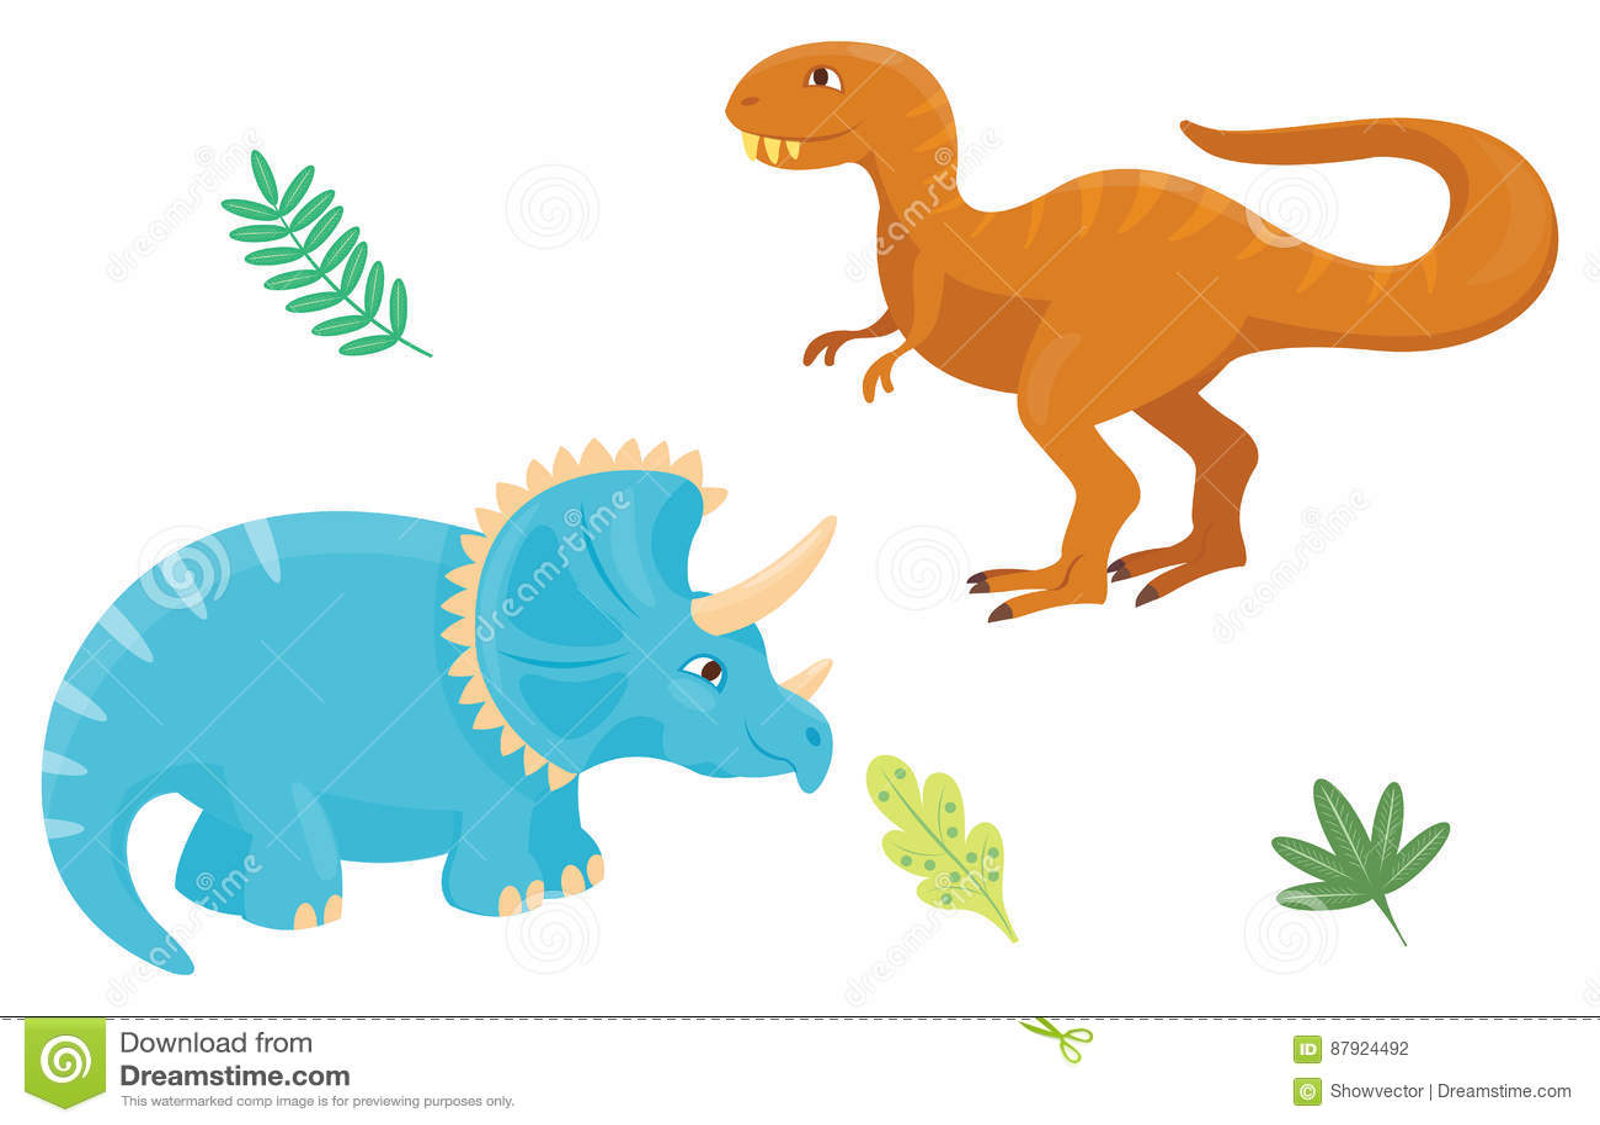 Cartoon Dinosaurs Vector Illustration Isolated Monster Animal Dino